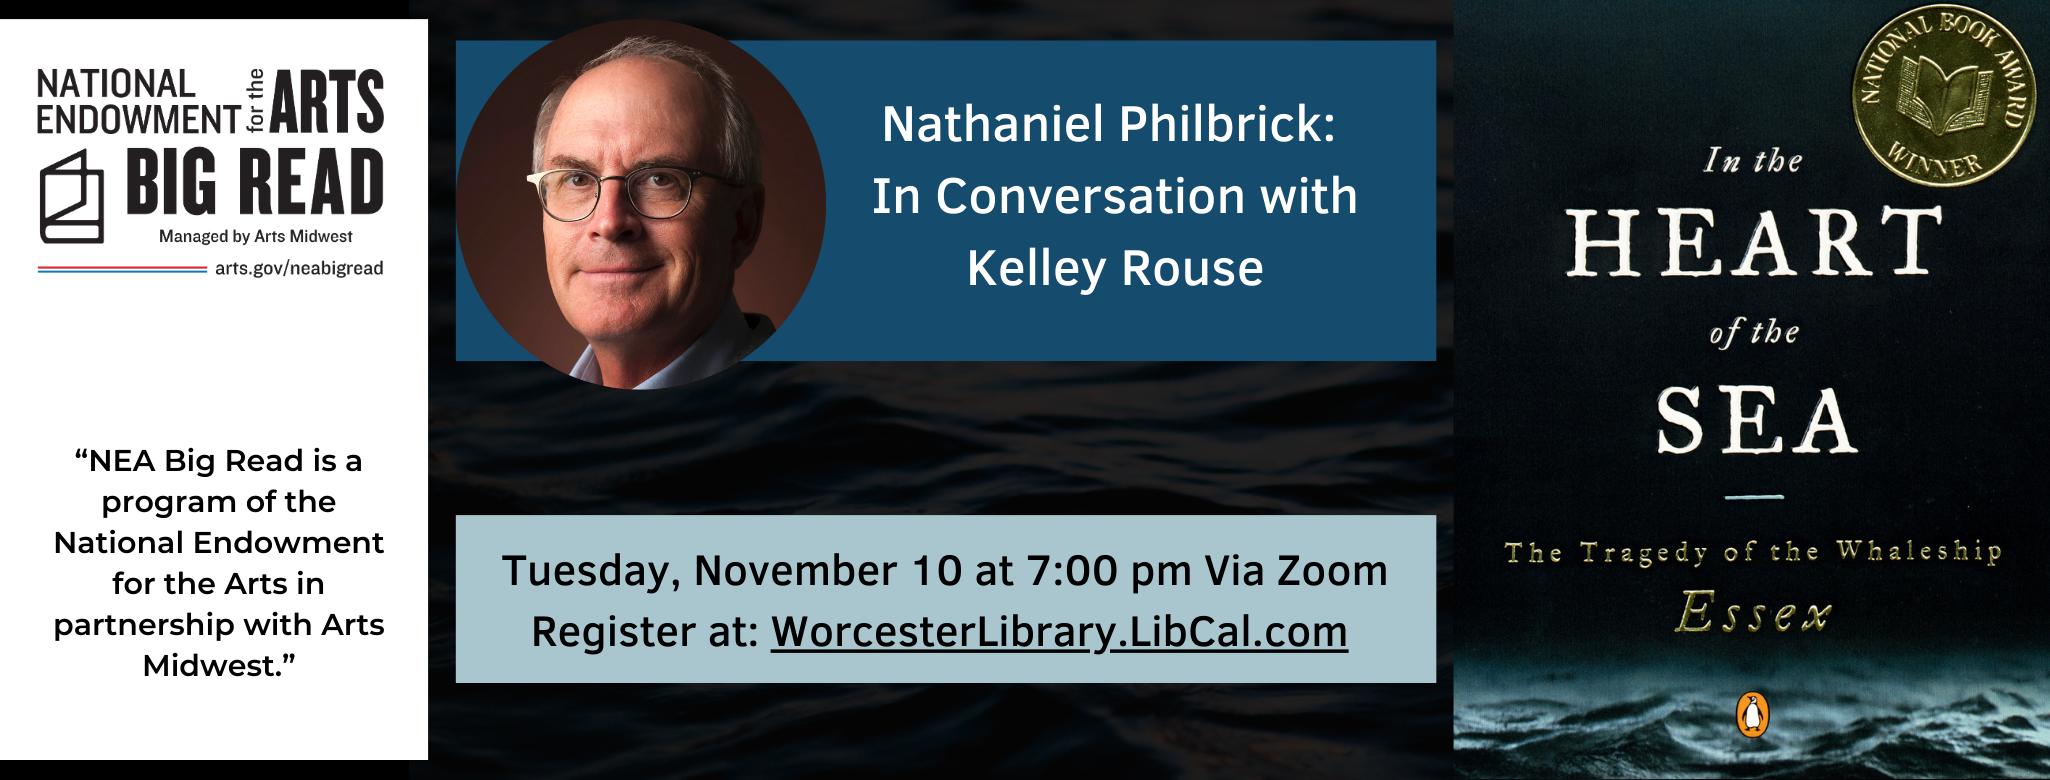 NEA Big Read Keynote Speaker: Nathaniel Philbrick